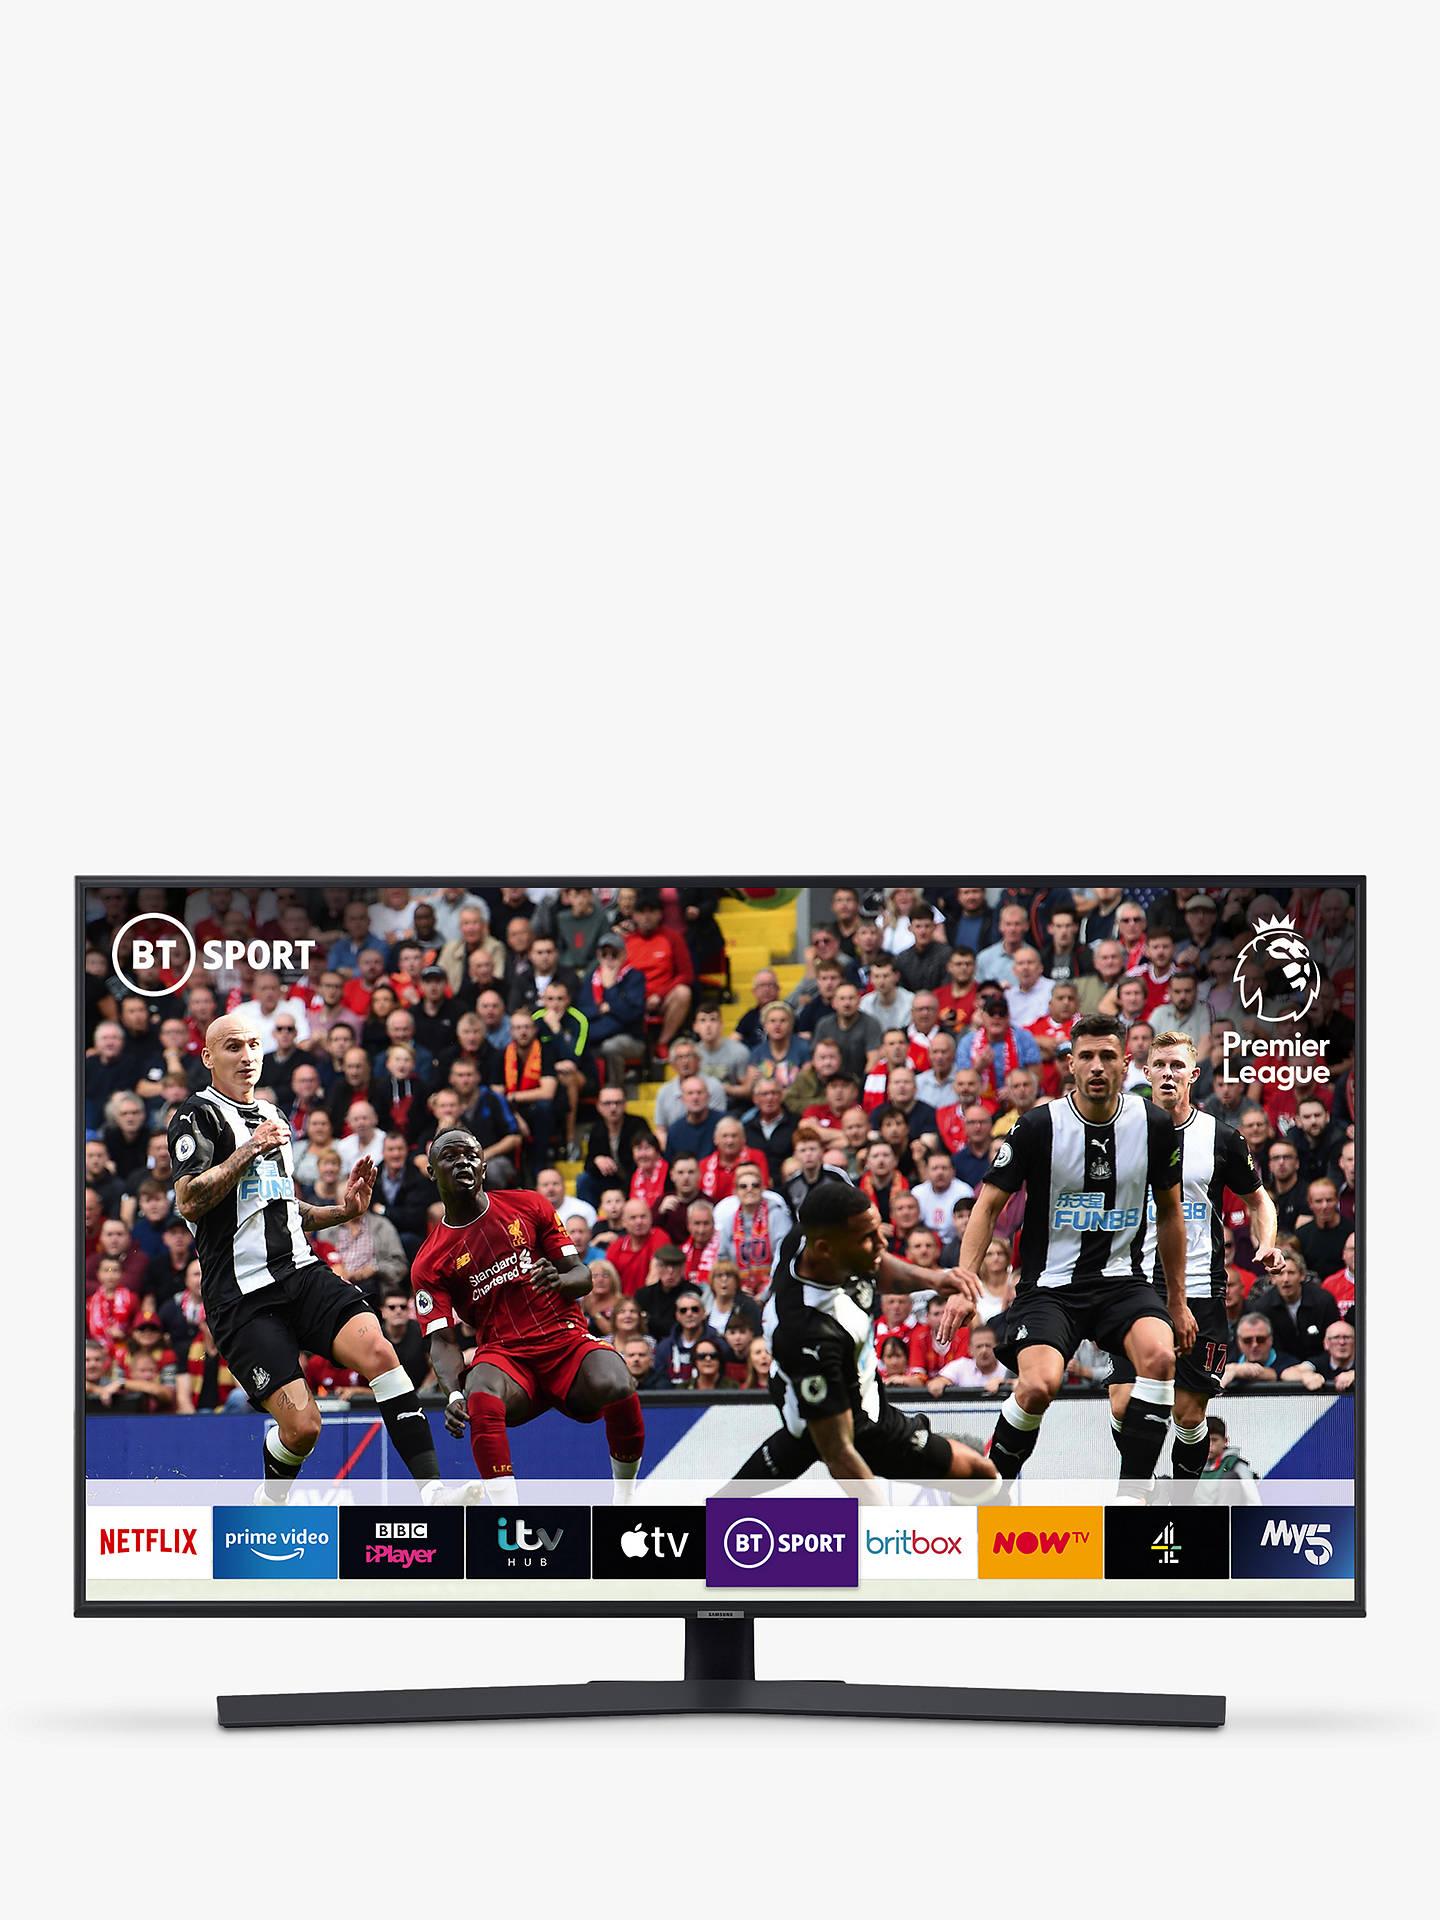 Samsung UE43RU7400 (2019) HDR 4K Ultra HD Smart TV, 43